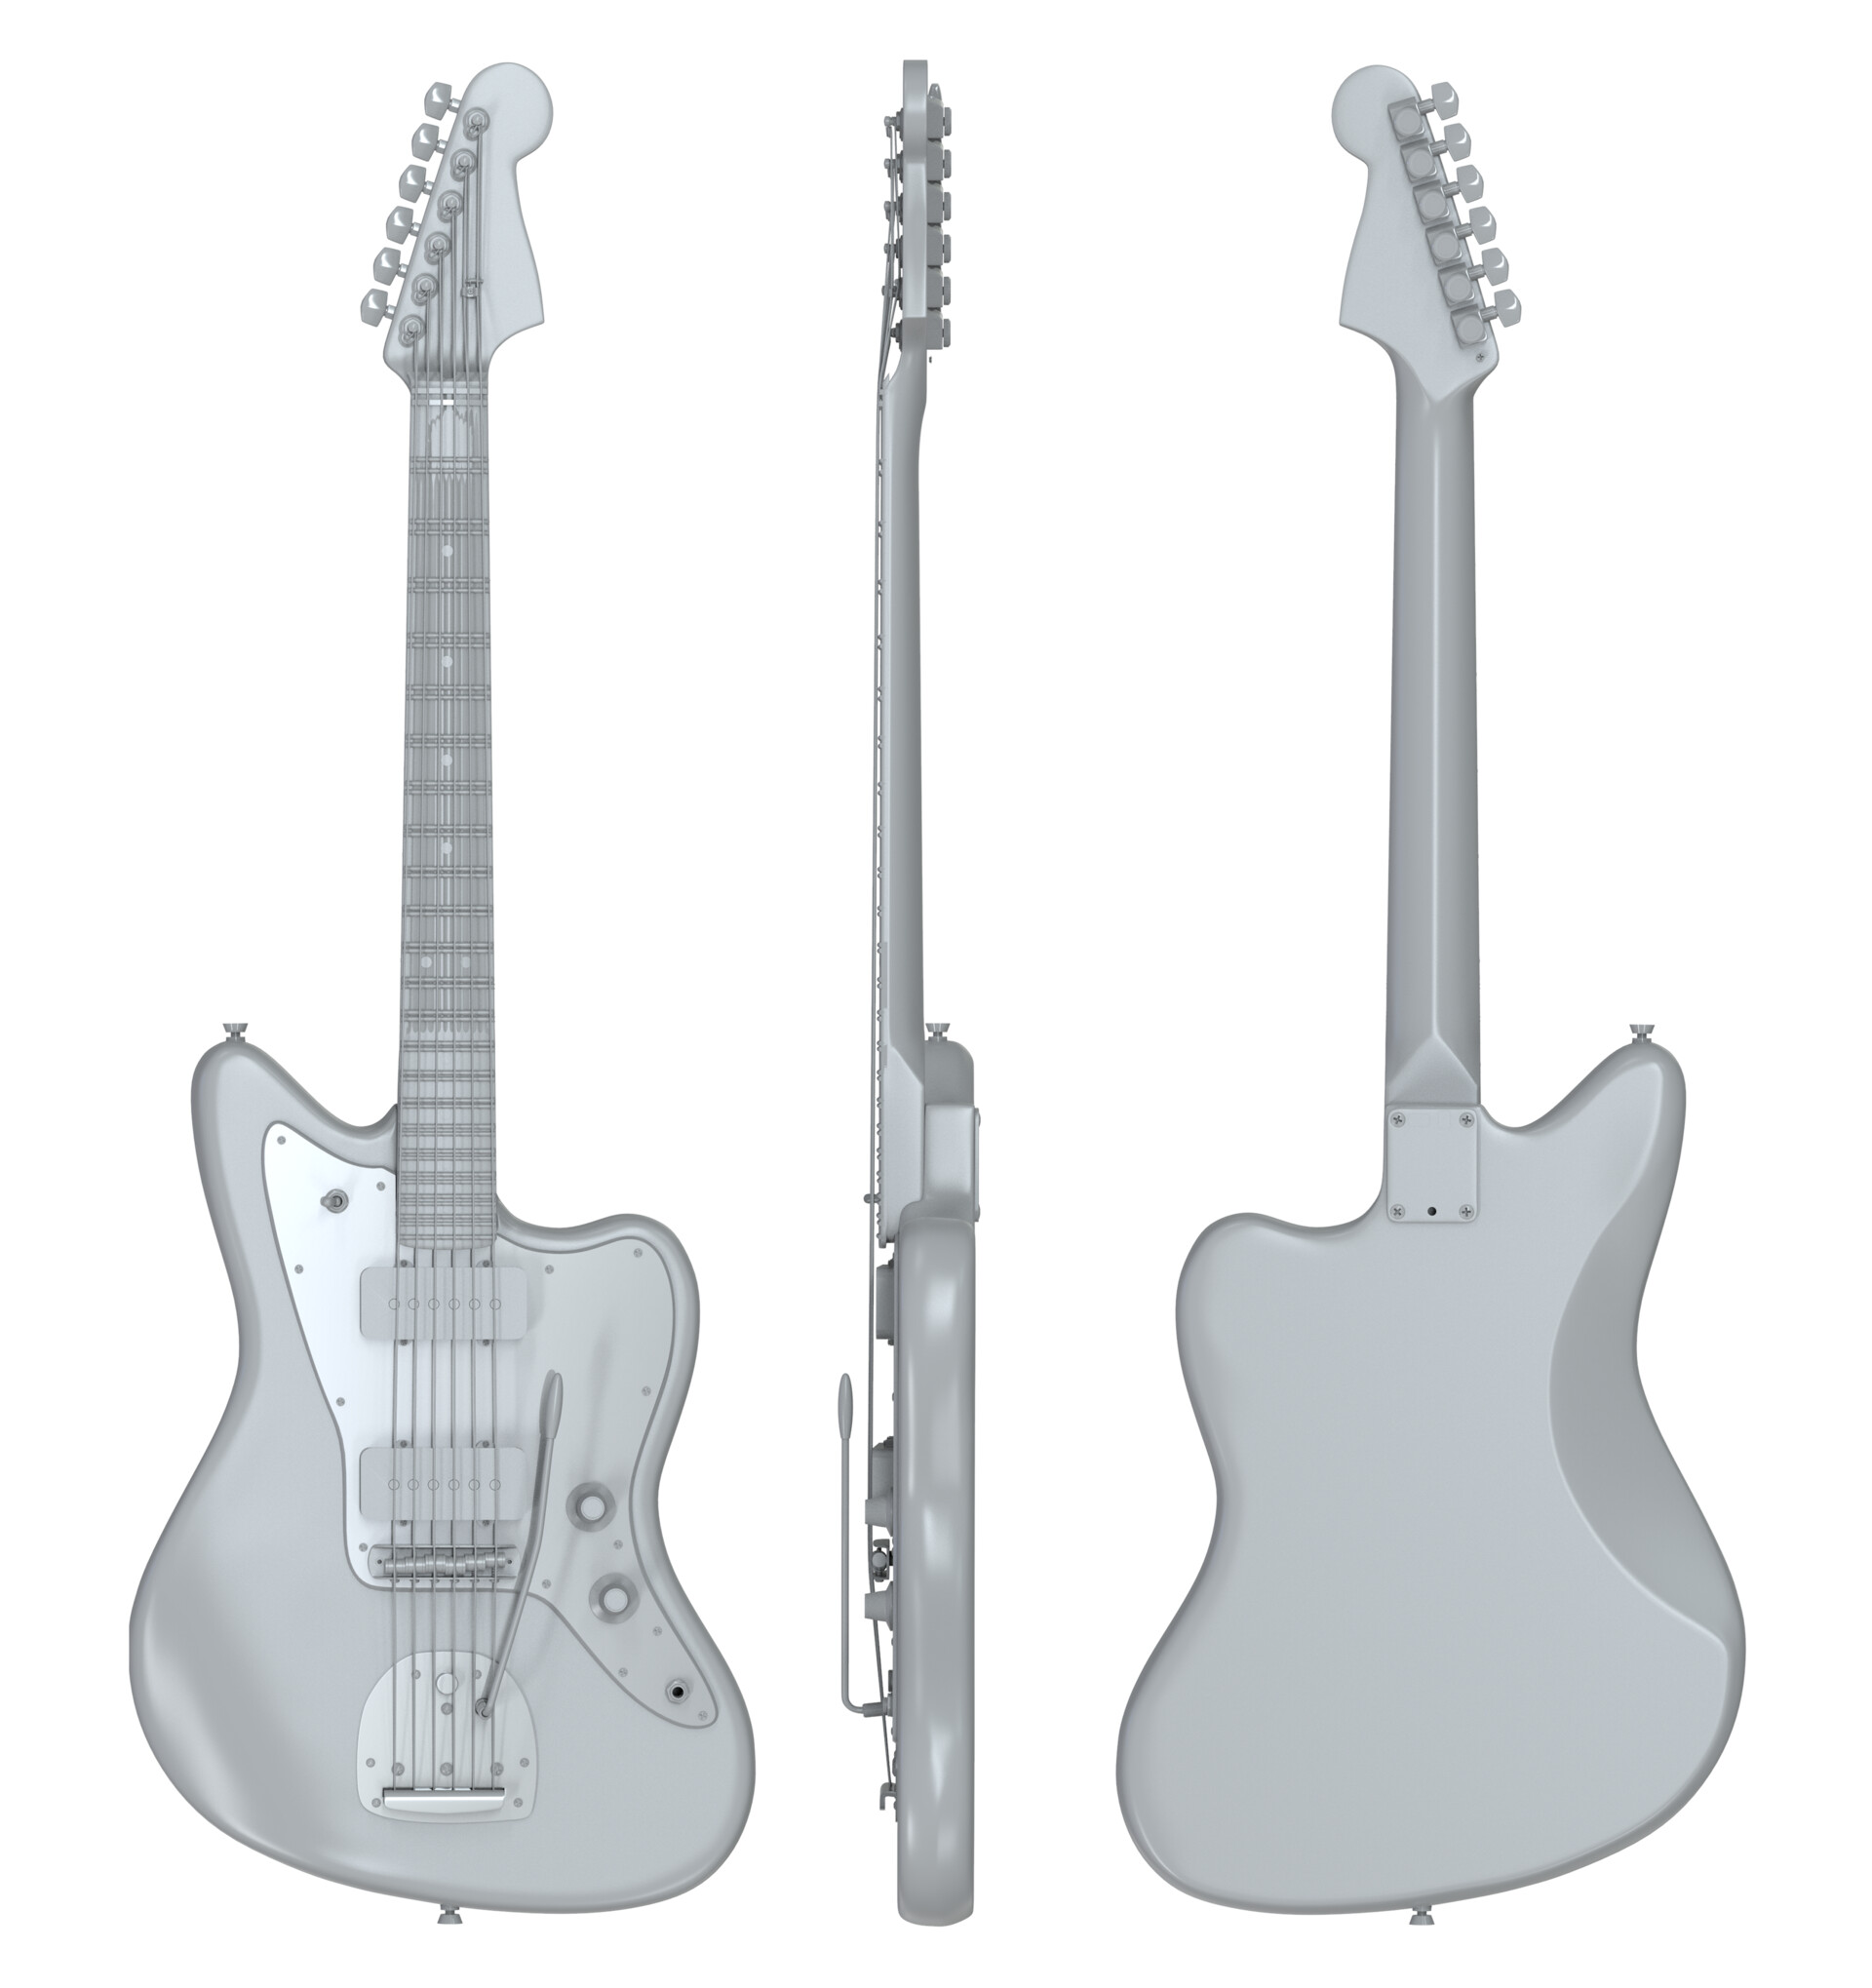 Roberto tula guitar